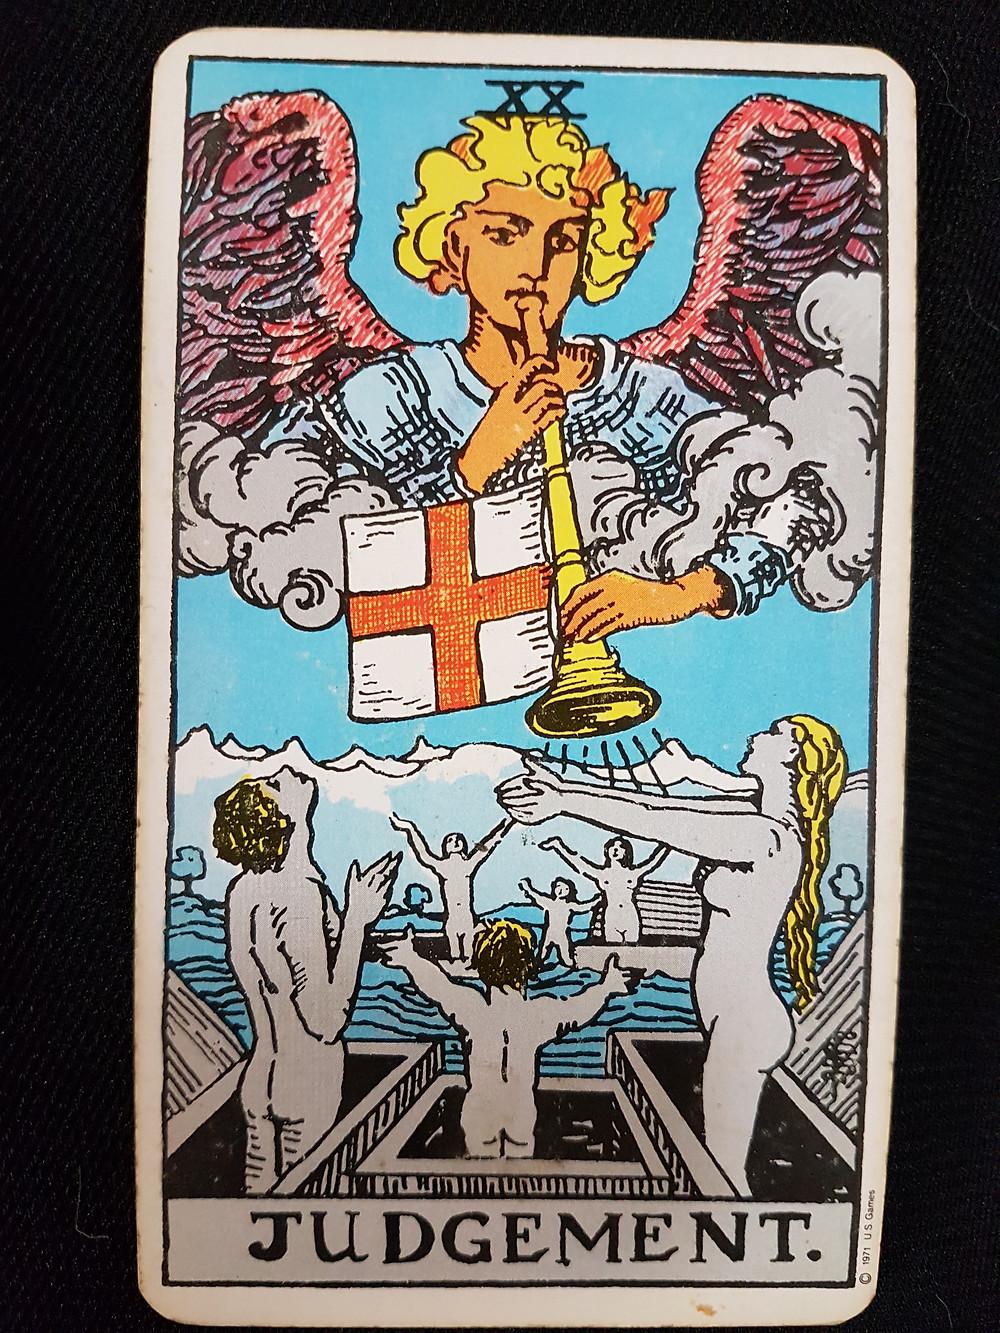 The Judgement Card No 20 | lynsreadings.com